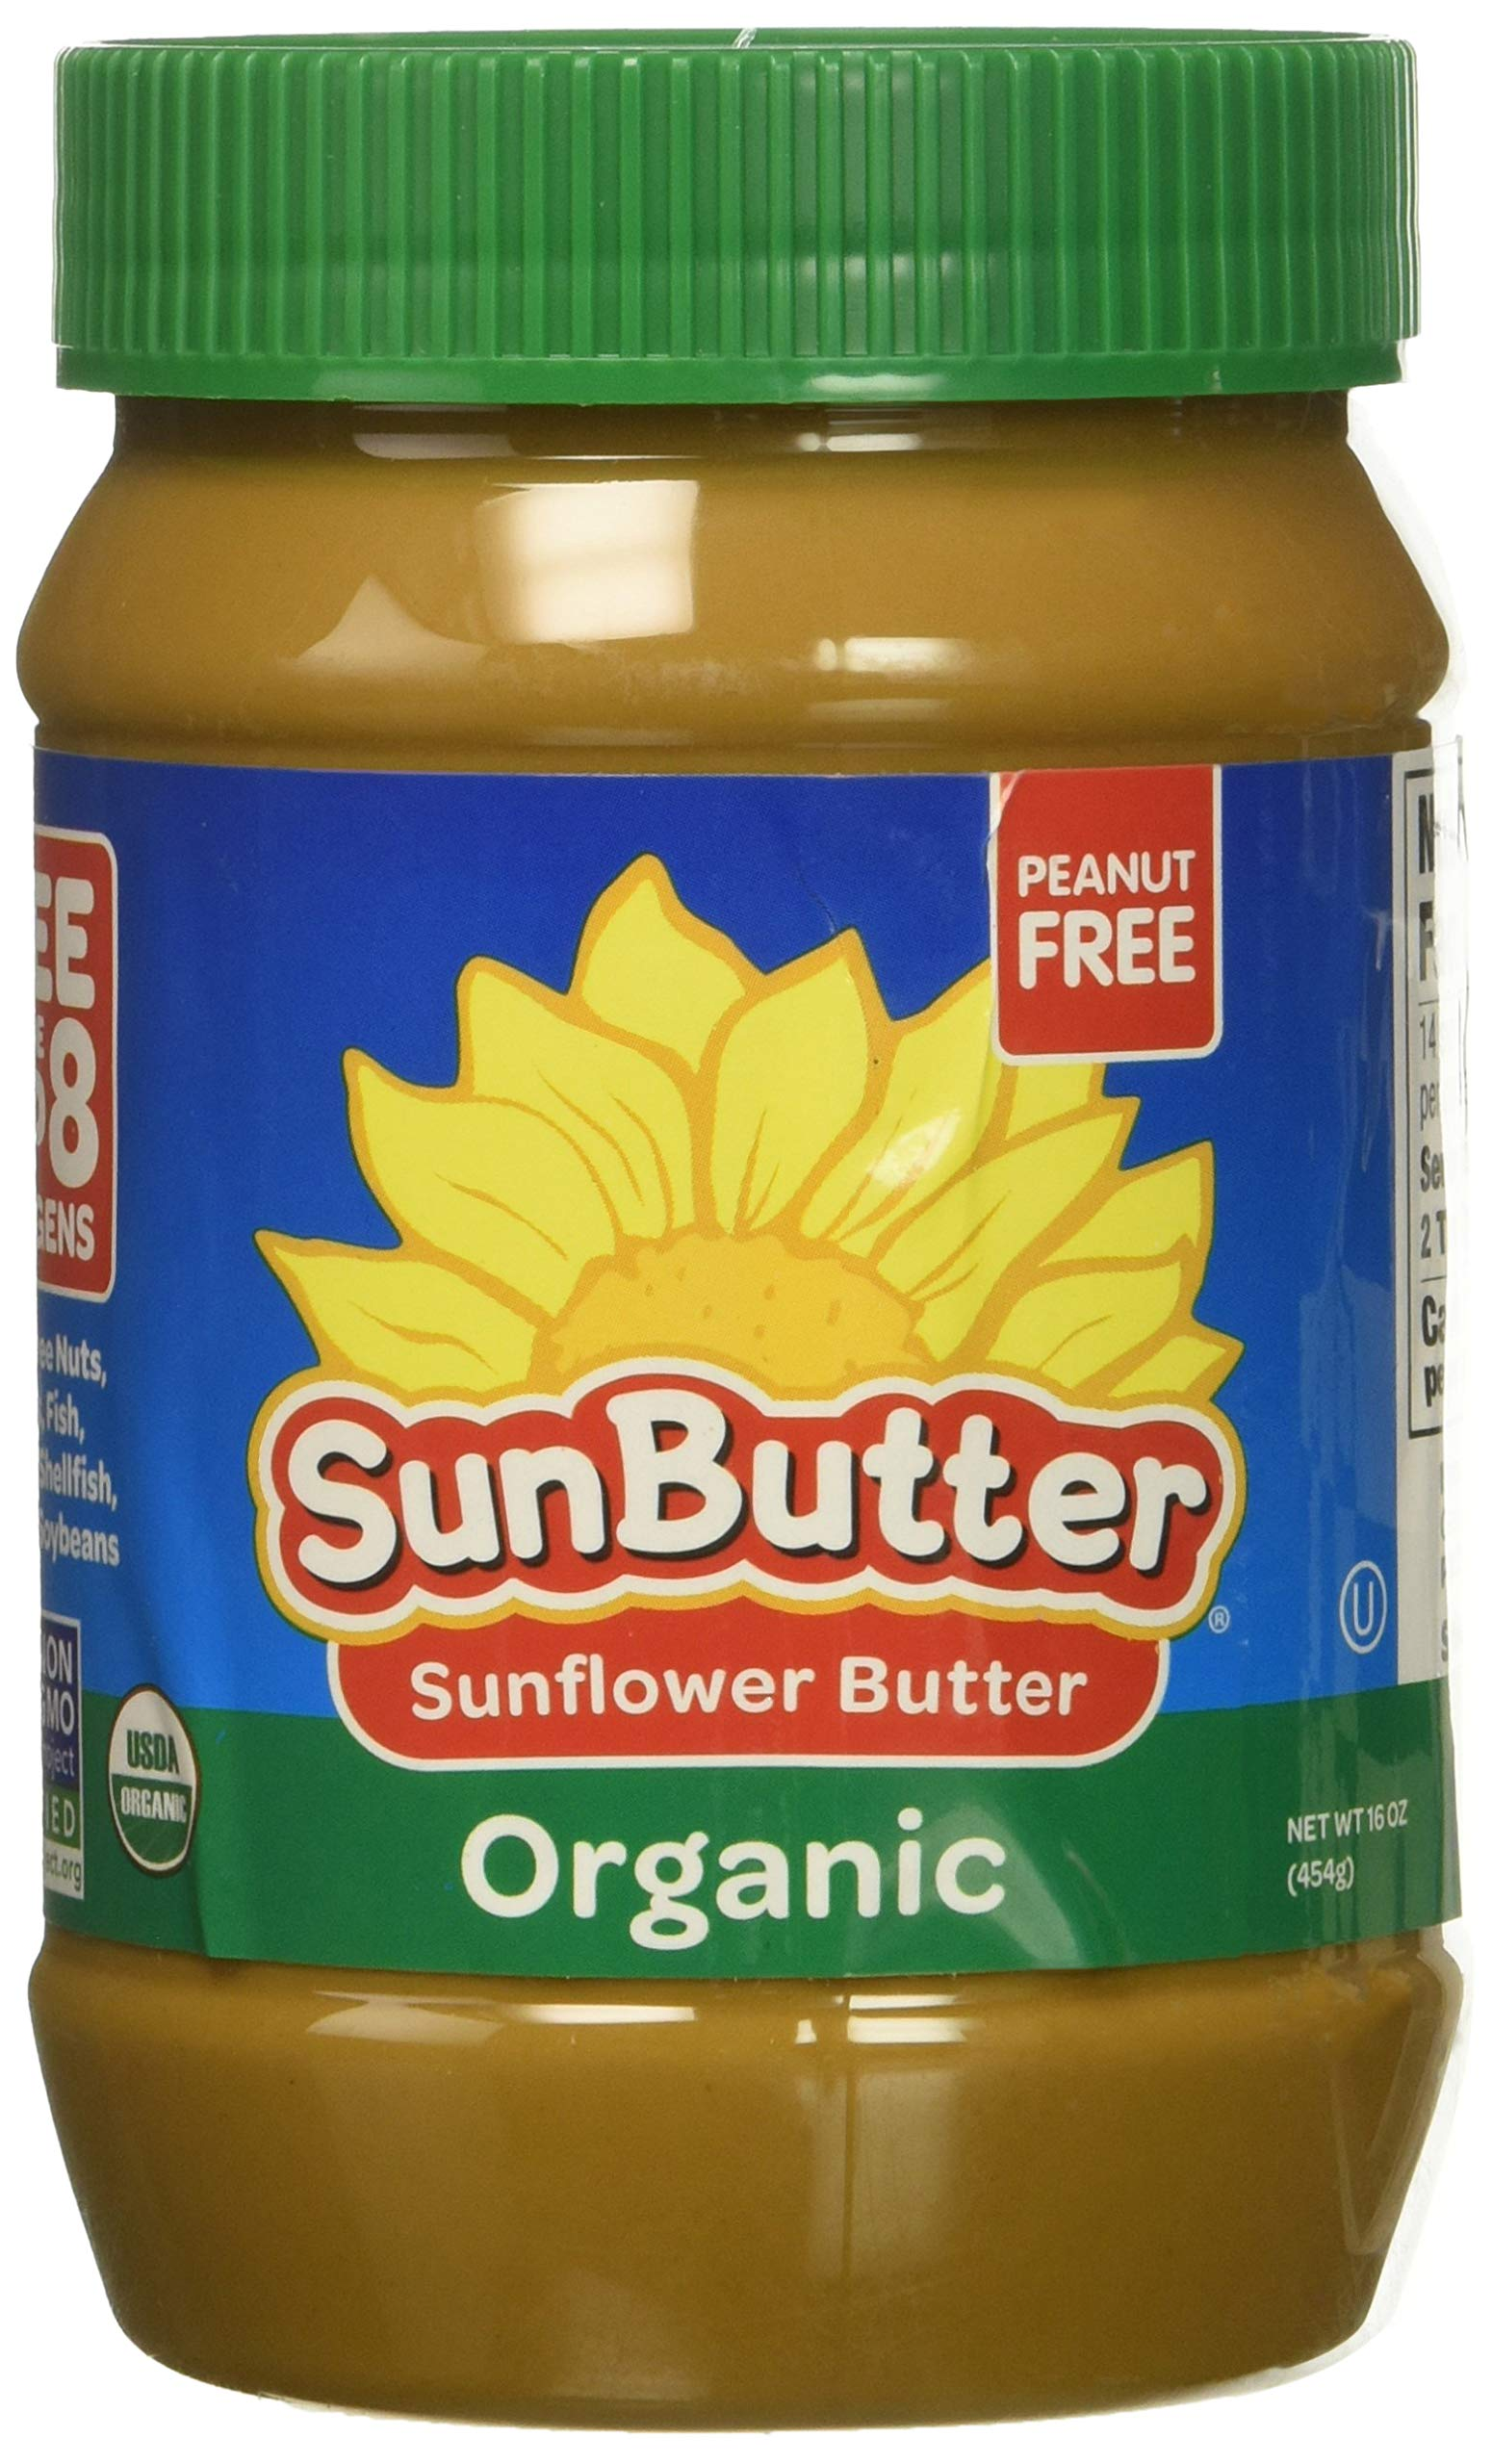 SunButter Organic Sunflower Seed Spread, 16-Ounce Plastic Jar by SunButter